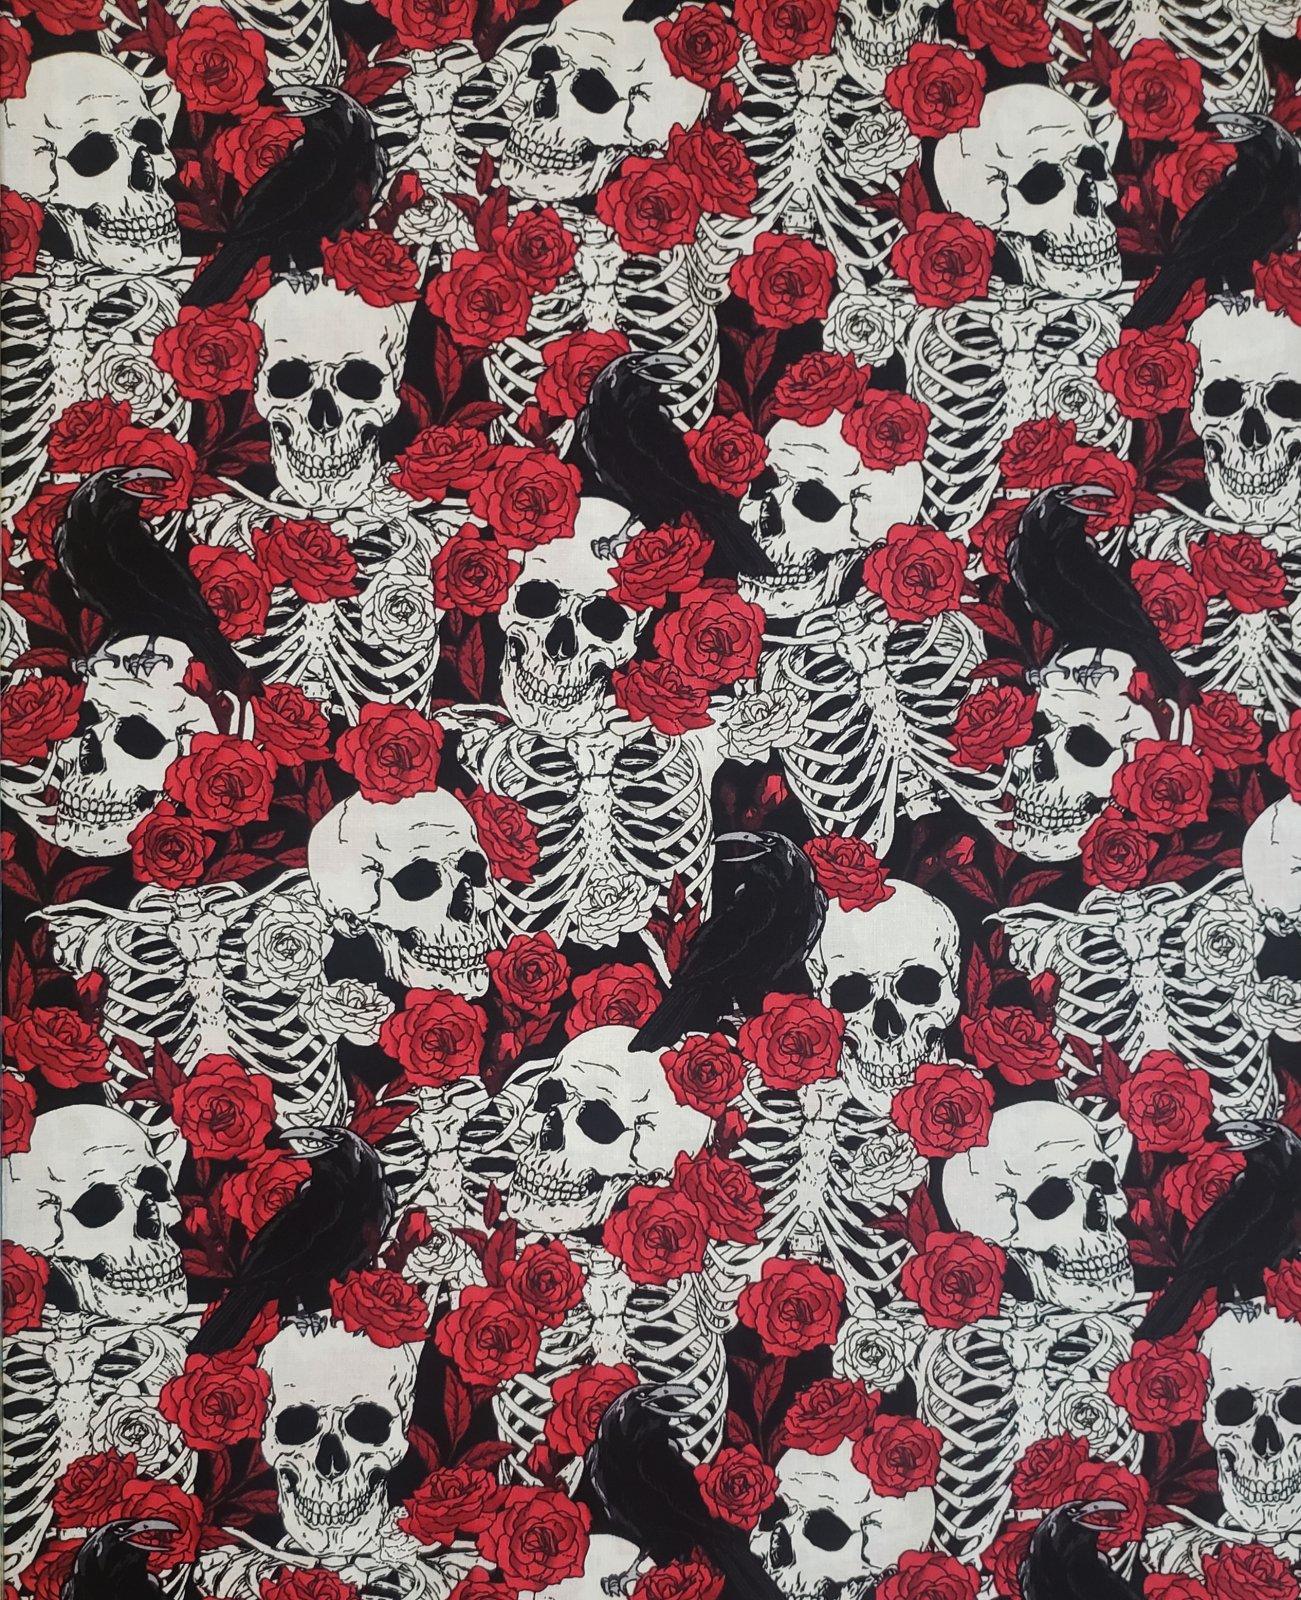 Skulls and Roses 16737 Black